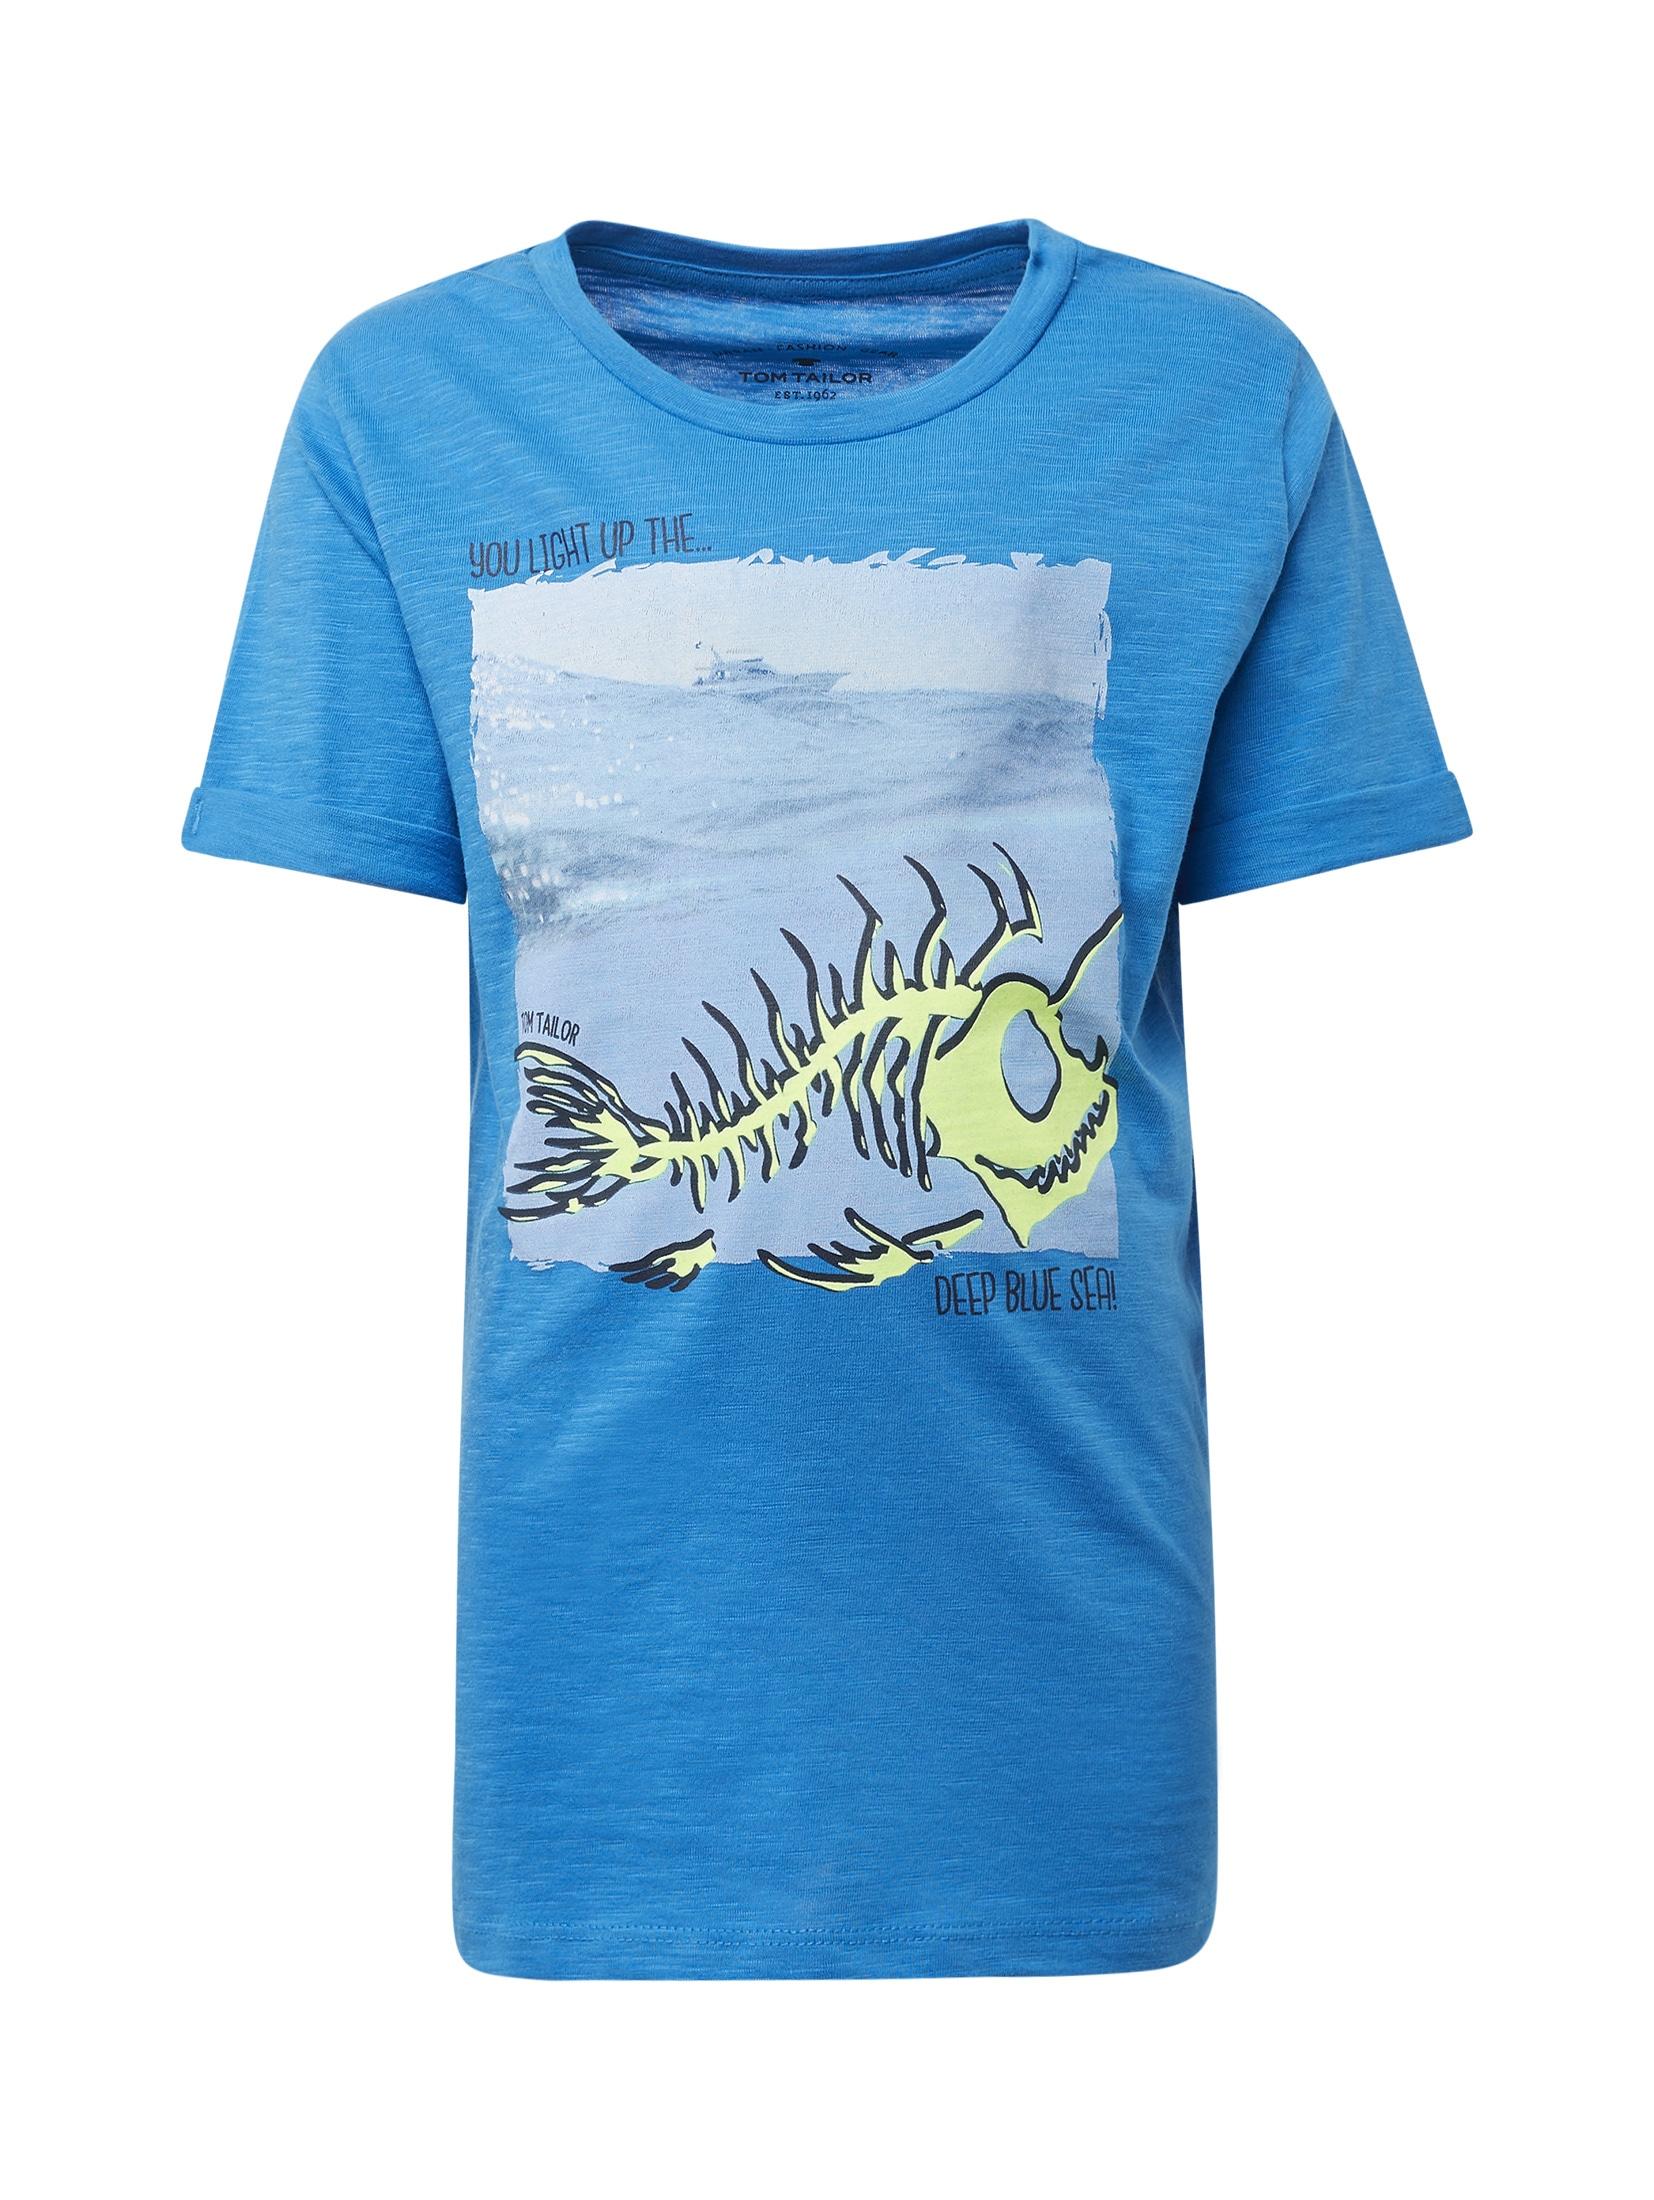 TOM TAILOR T-Shirt T-Shirt mit Brust-Print